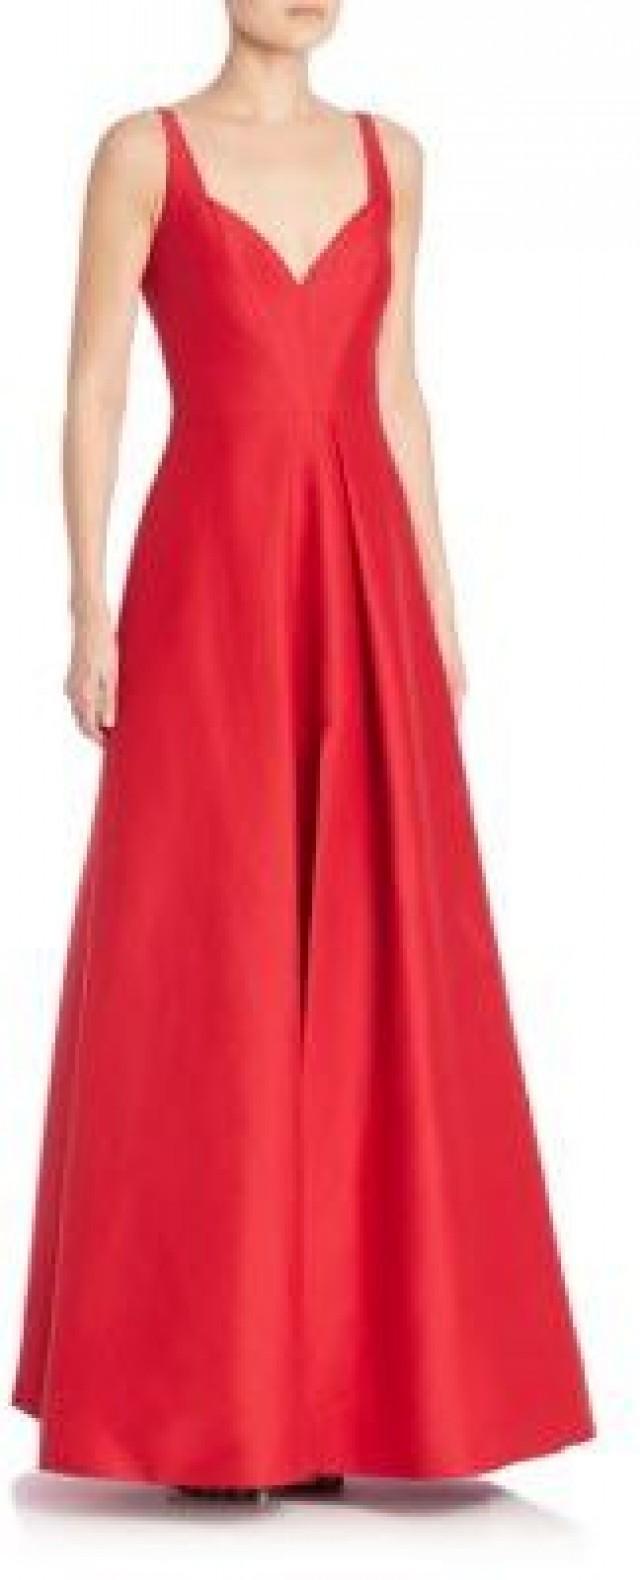 Halston Heritage Solid Pleated Gown #2533630 - Weddbook